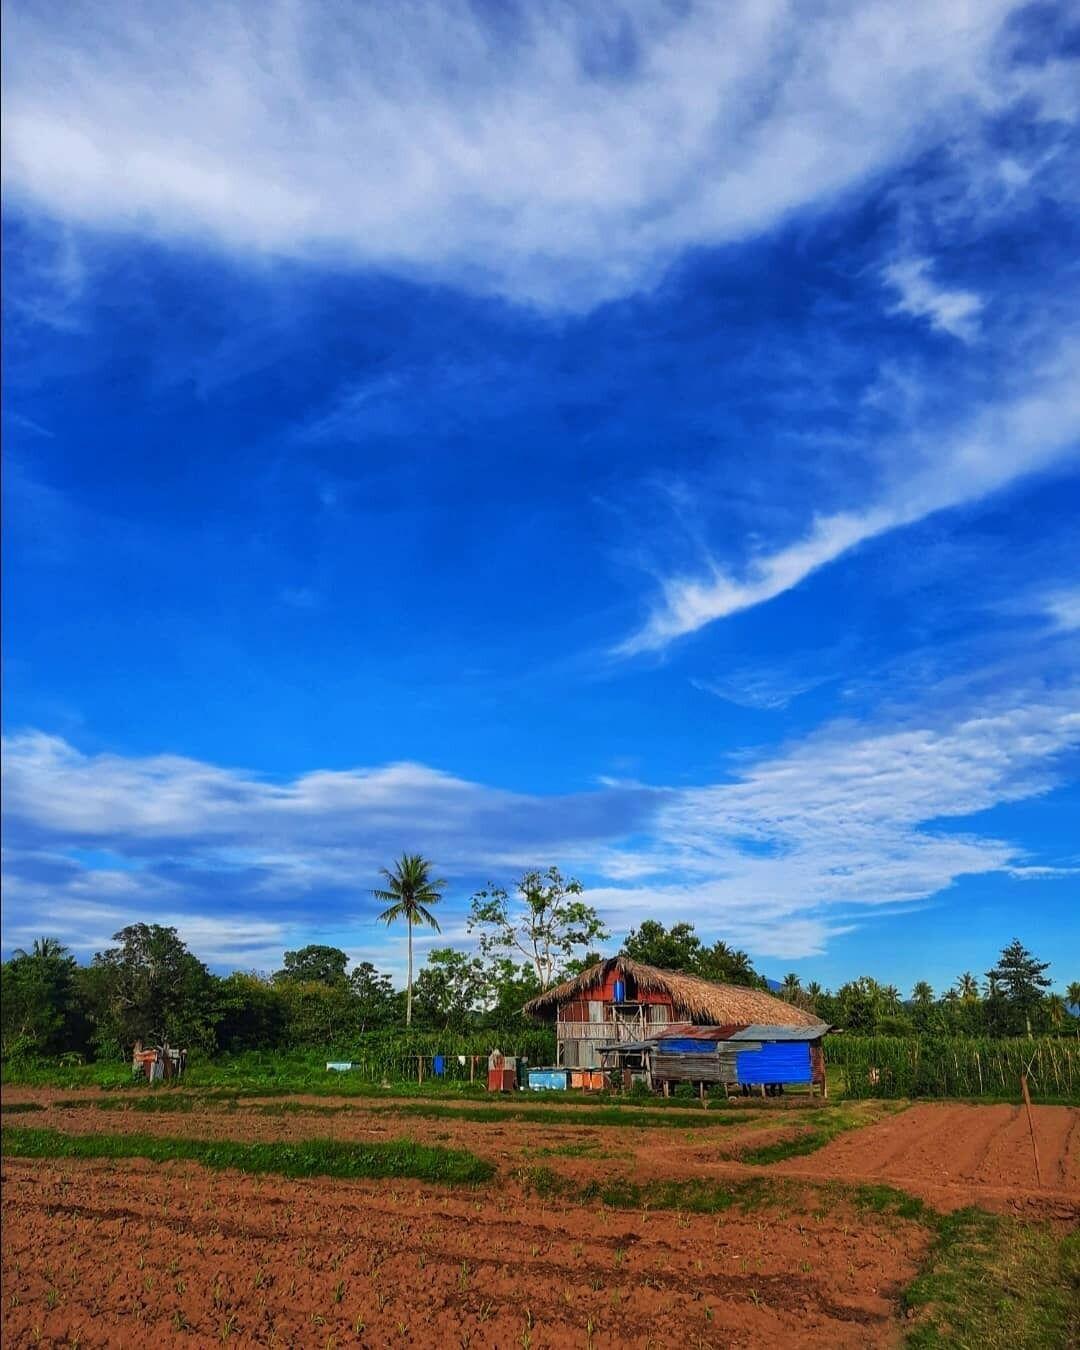 Вакцинация от COVID-19 является обязательной в Индонезии